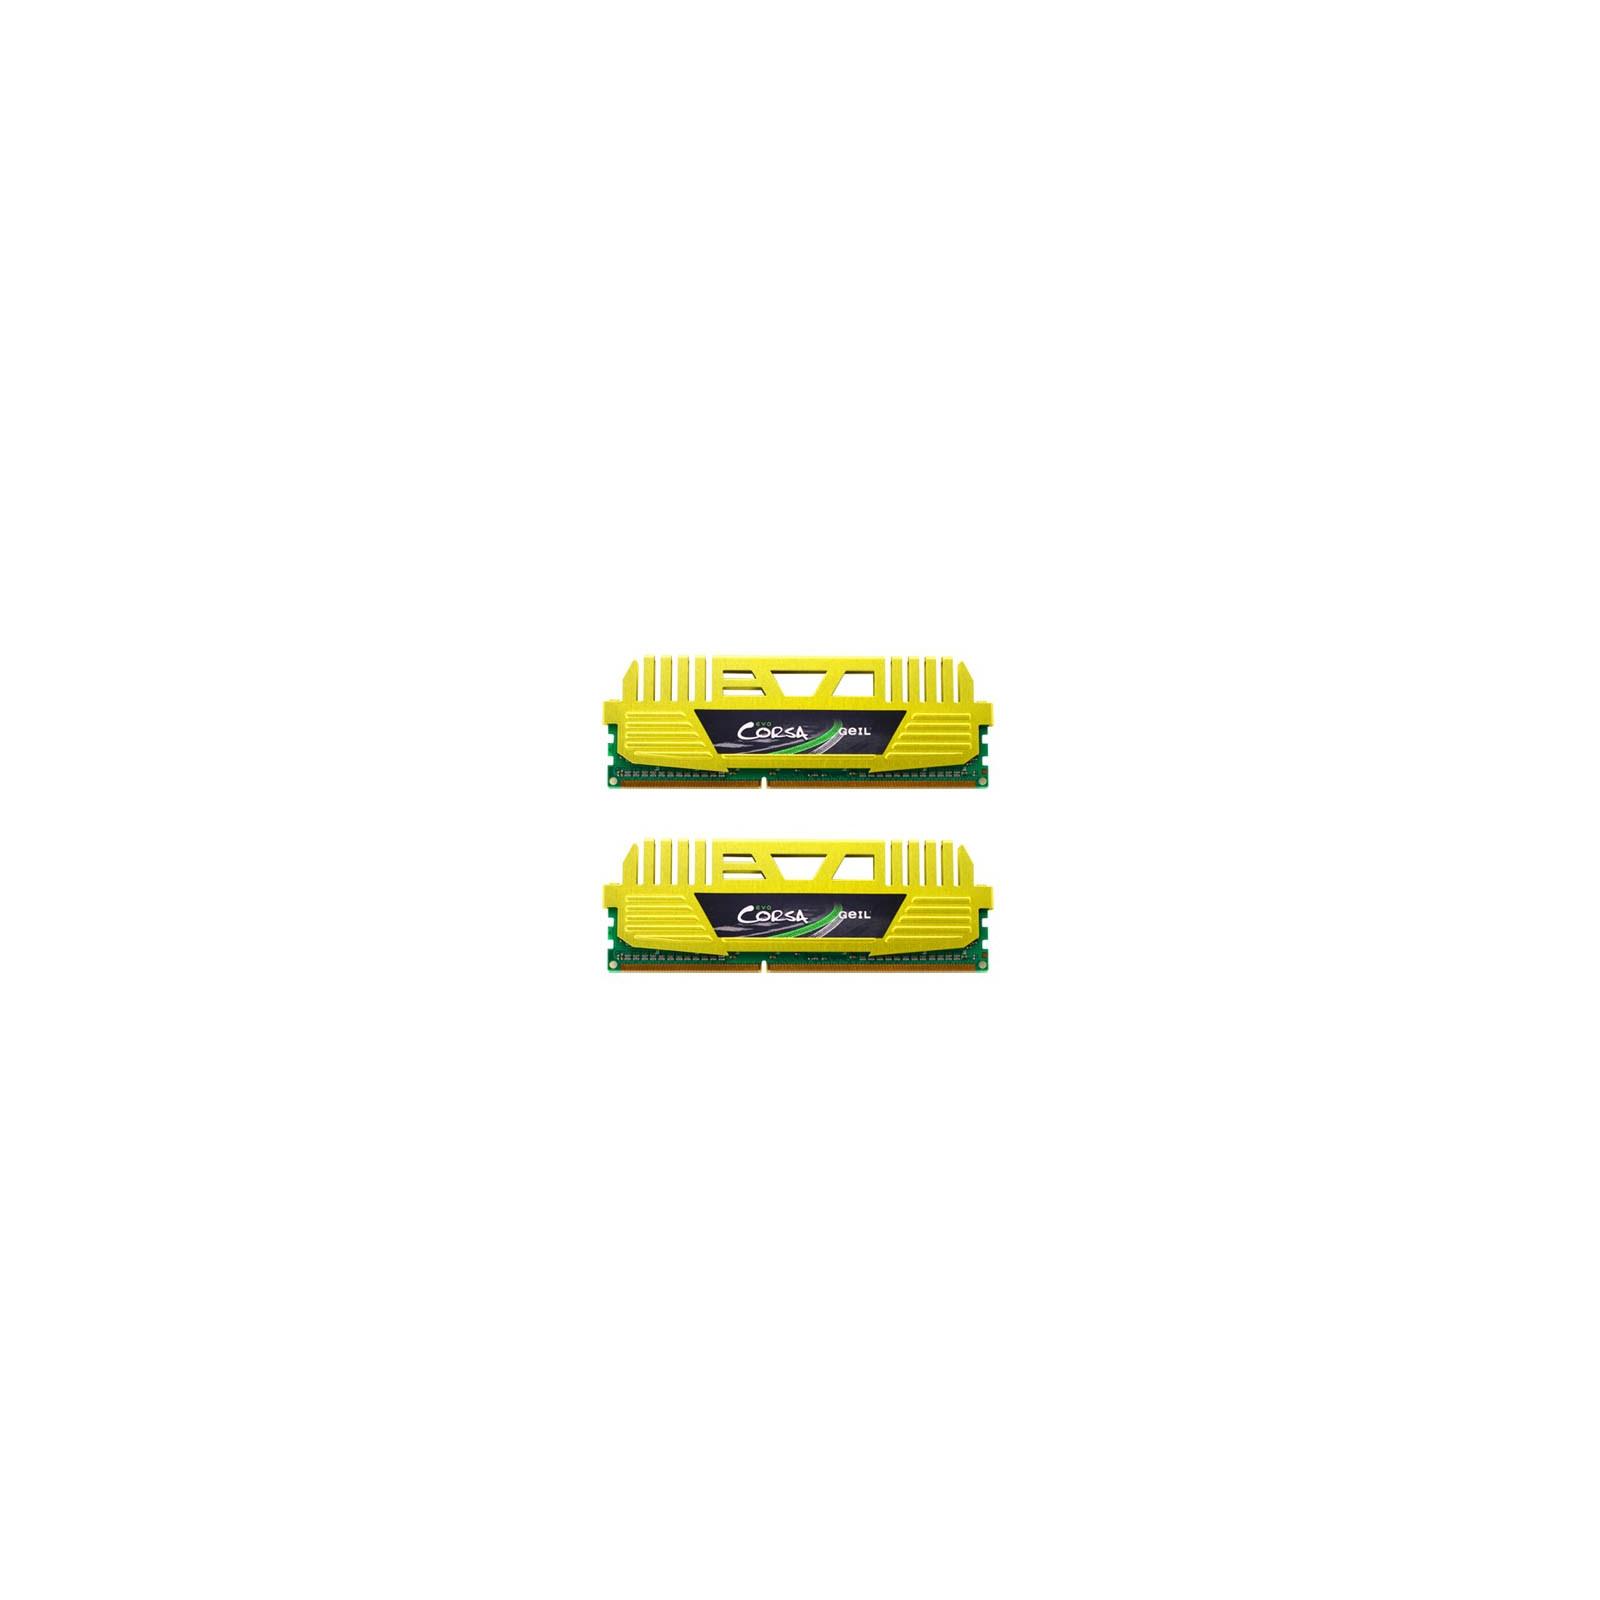 Модуль памяти для компьютера DDR3 4GB (2x2GB) 2133 MHz GEIL (GOC34GB2133C11DC)